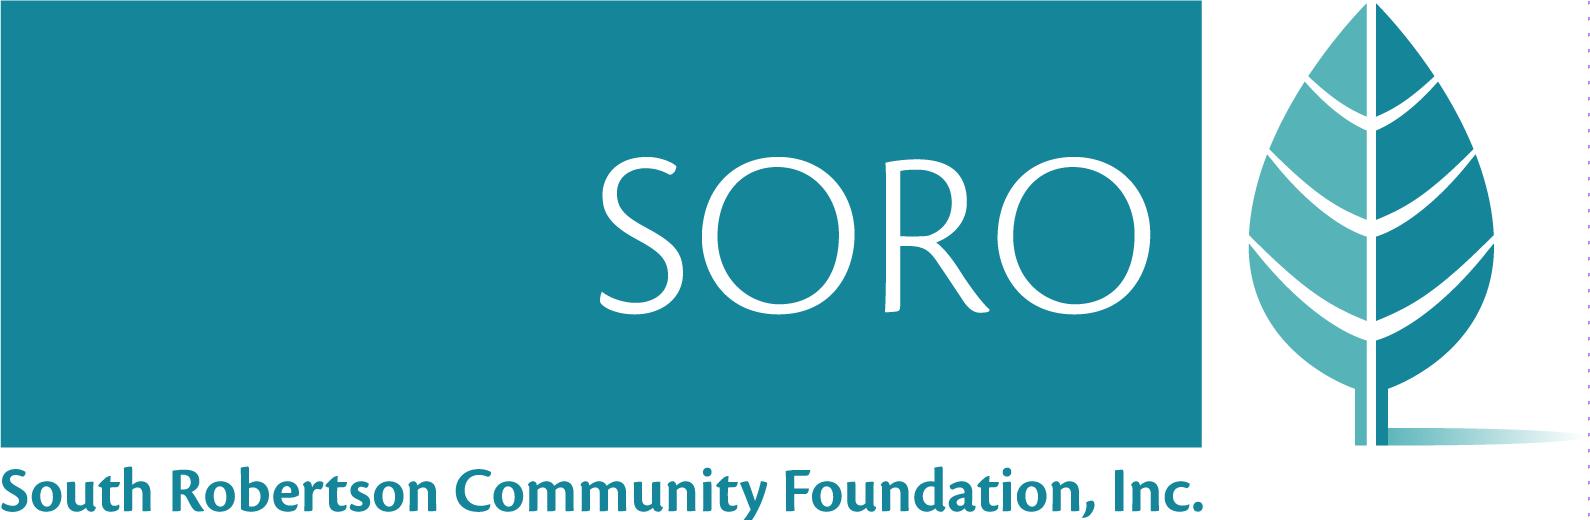 SoRo Community Foundation, Inc.